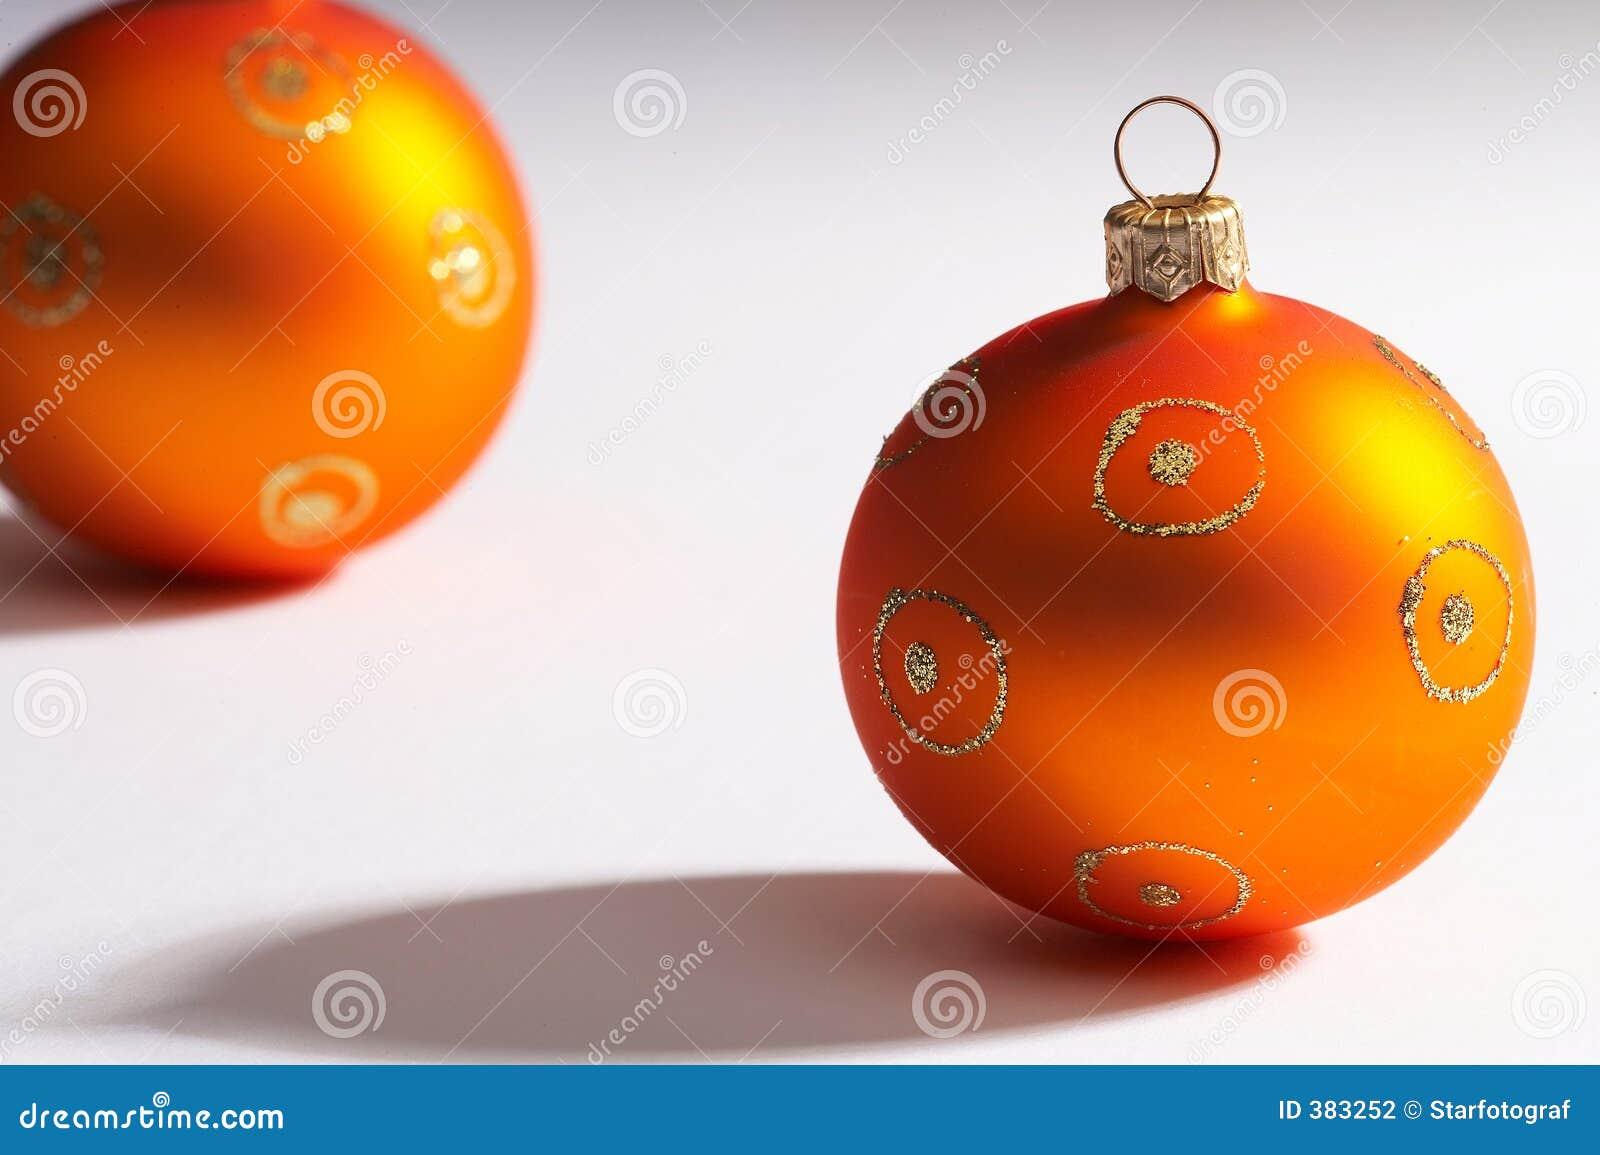 Christmas Tree Ball - Weihnachtskugel Stock Photo - Image ...